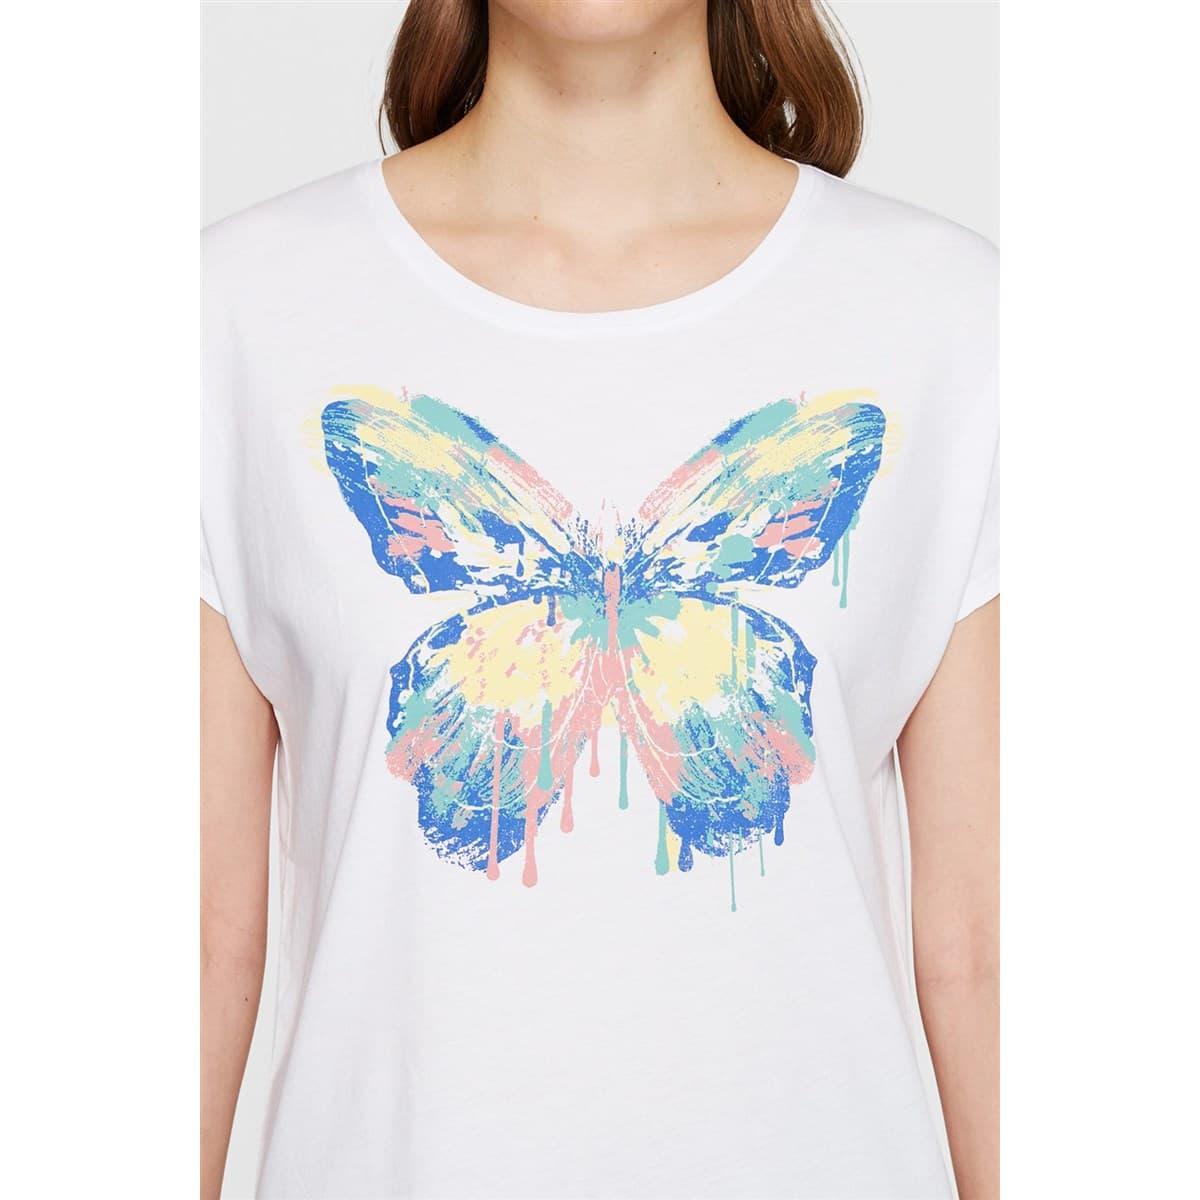 Kelebek Baskili Penye Beyaz